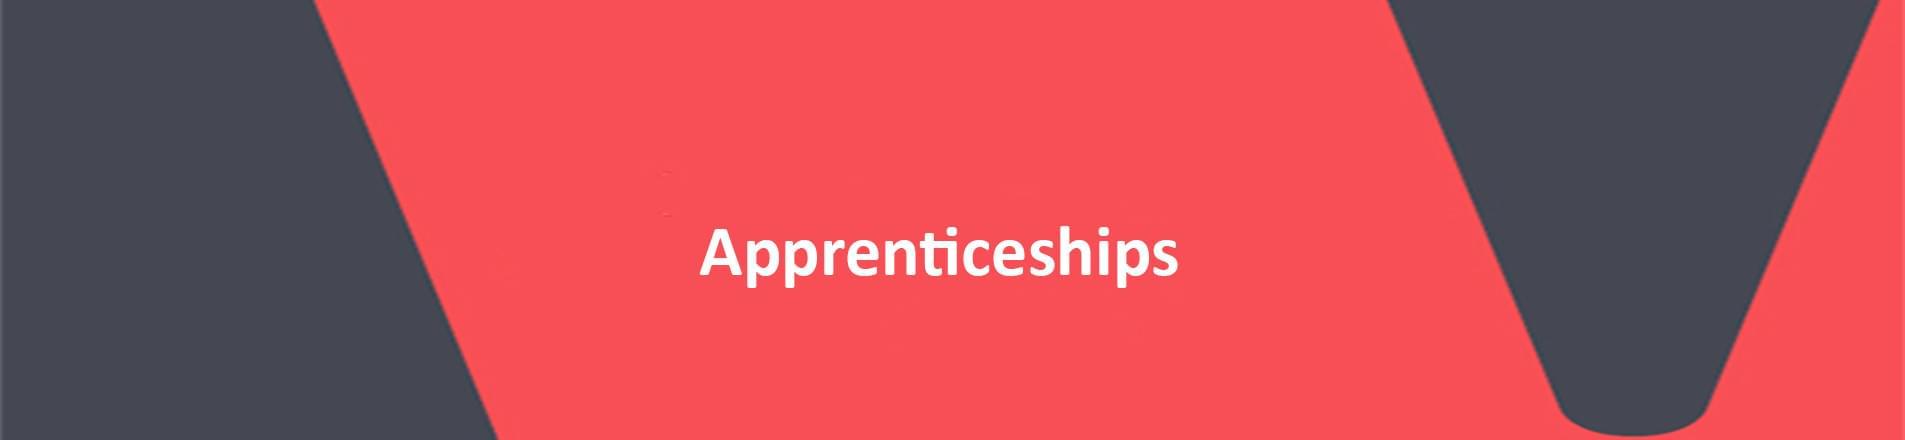 Apprenticeships on red VERCIDA background